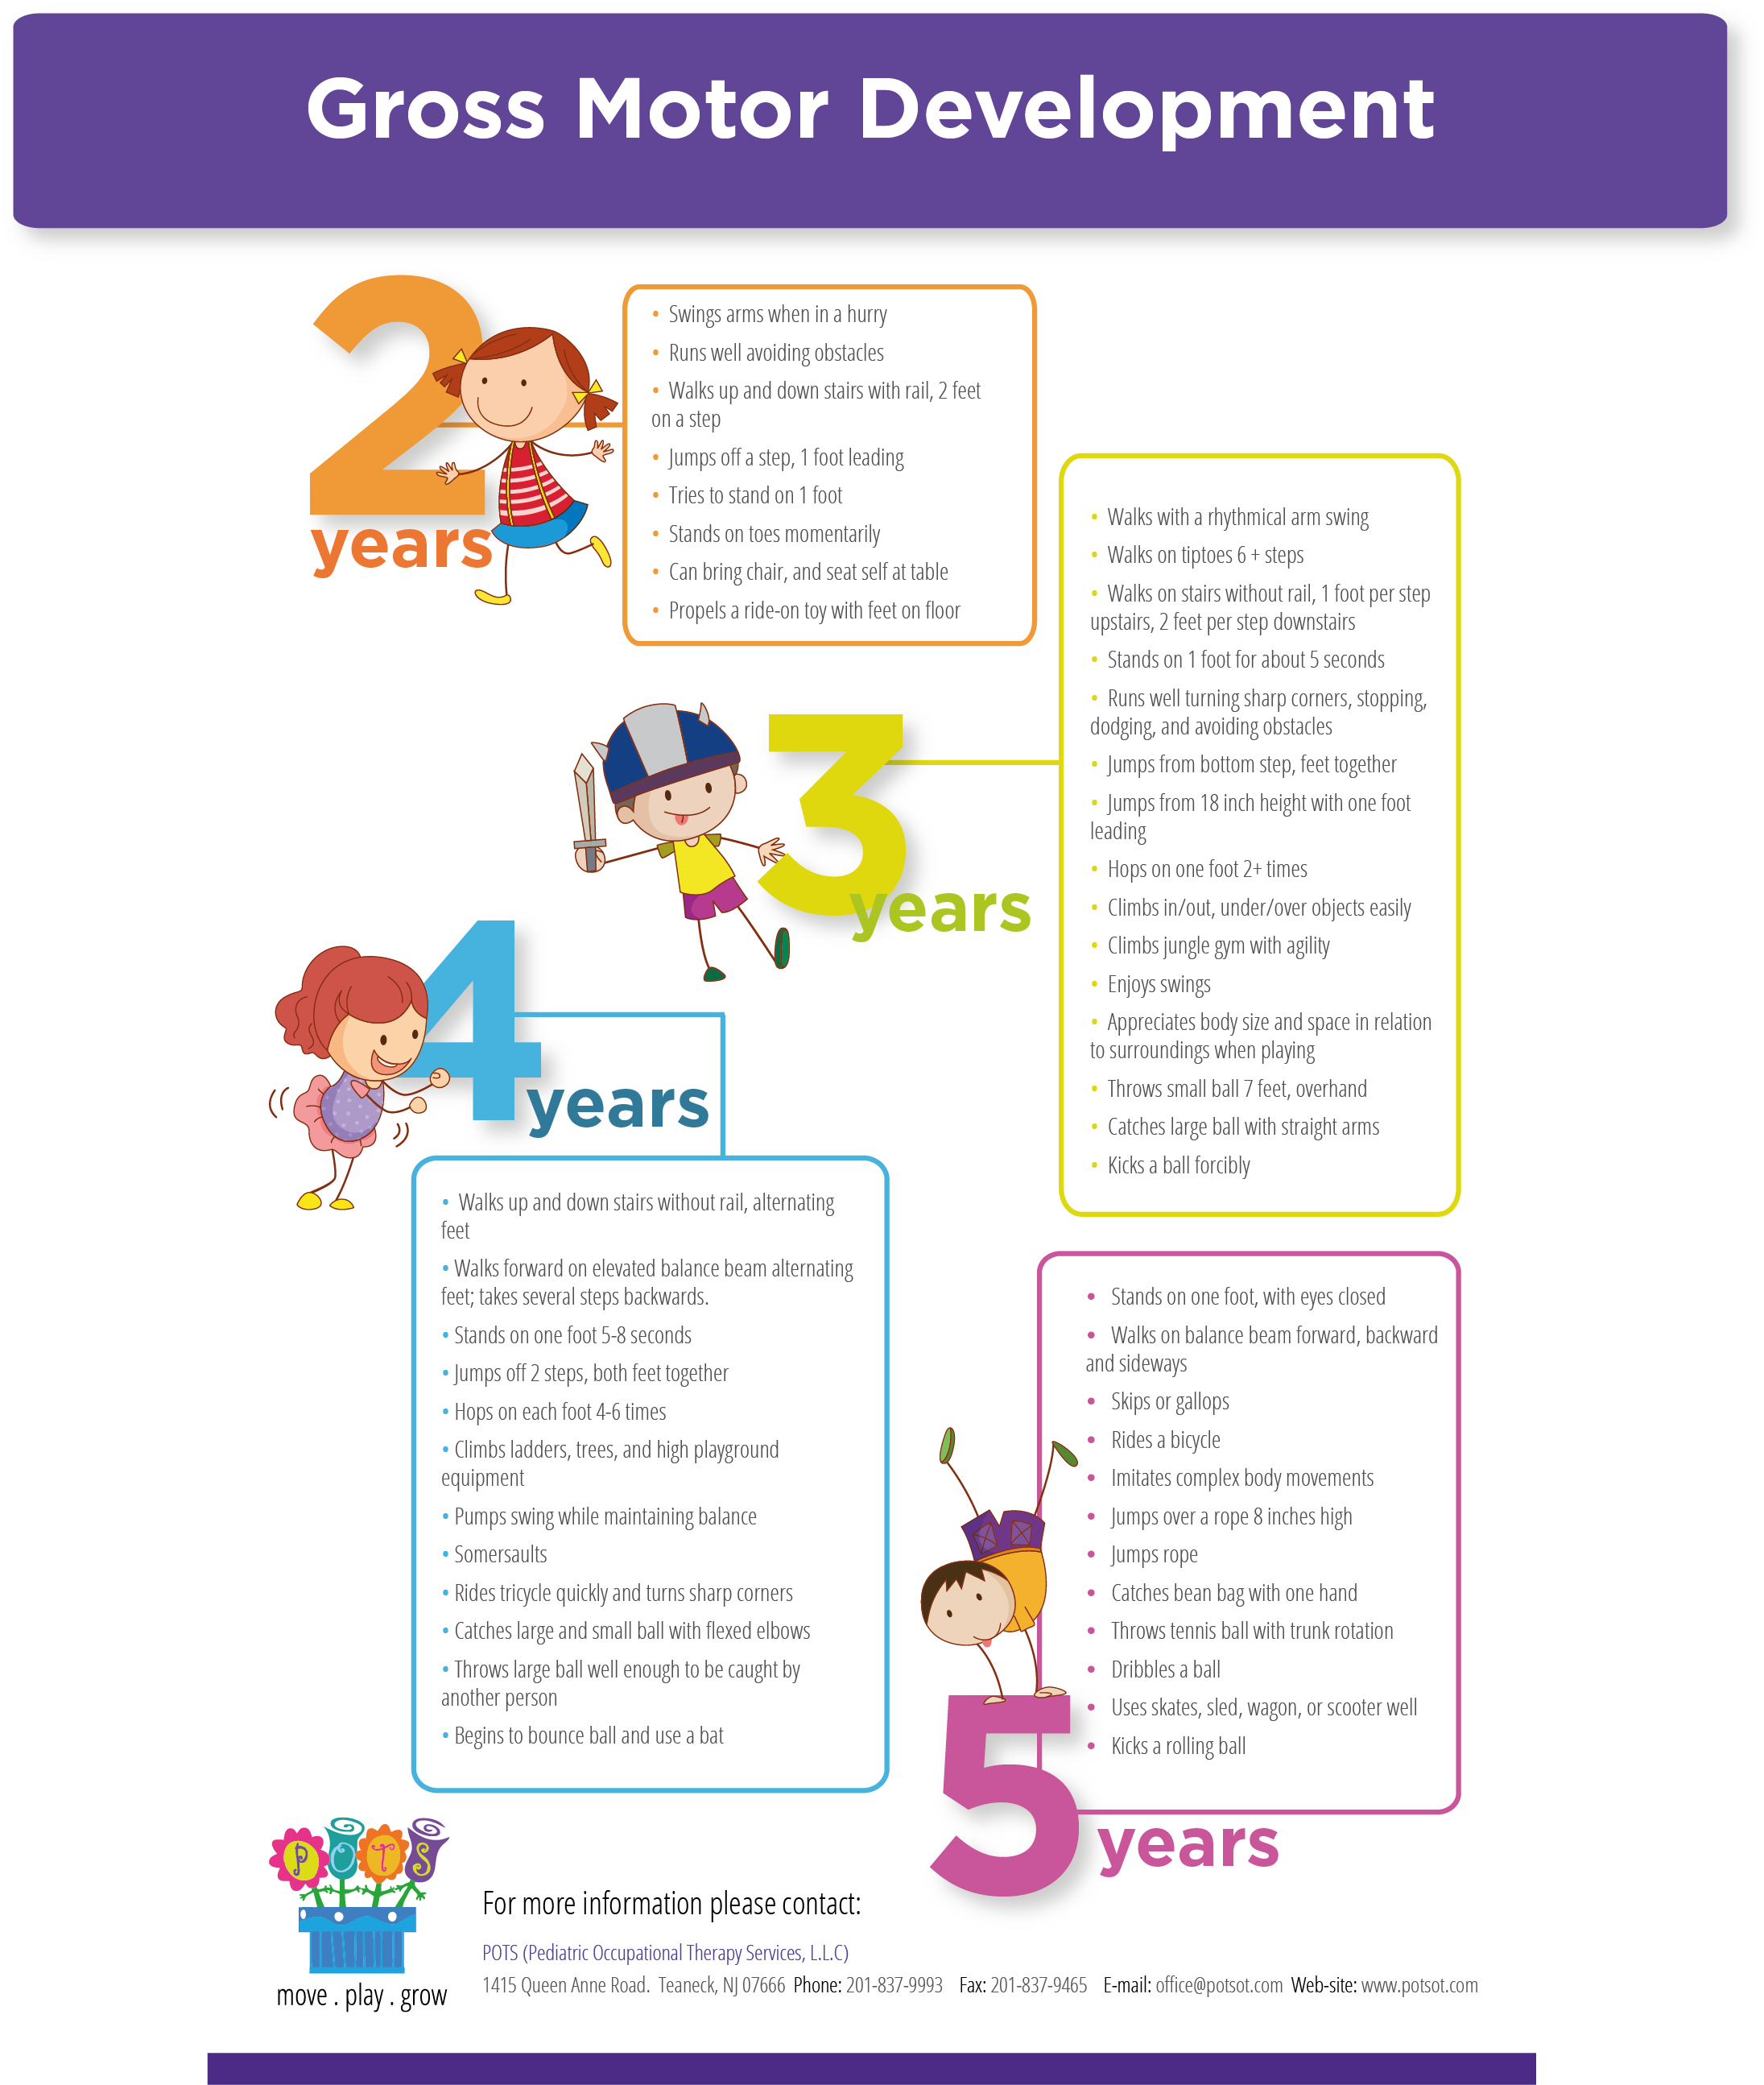 Gross moter development infographic from pediatric ot for Fine and gross motor skills activities